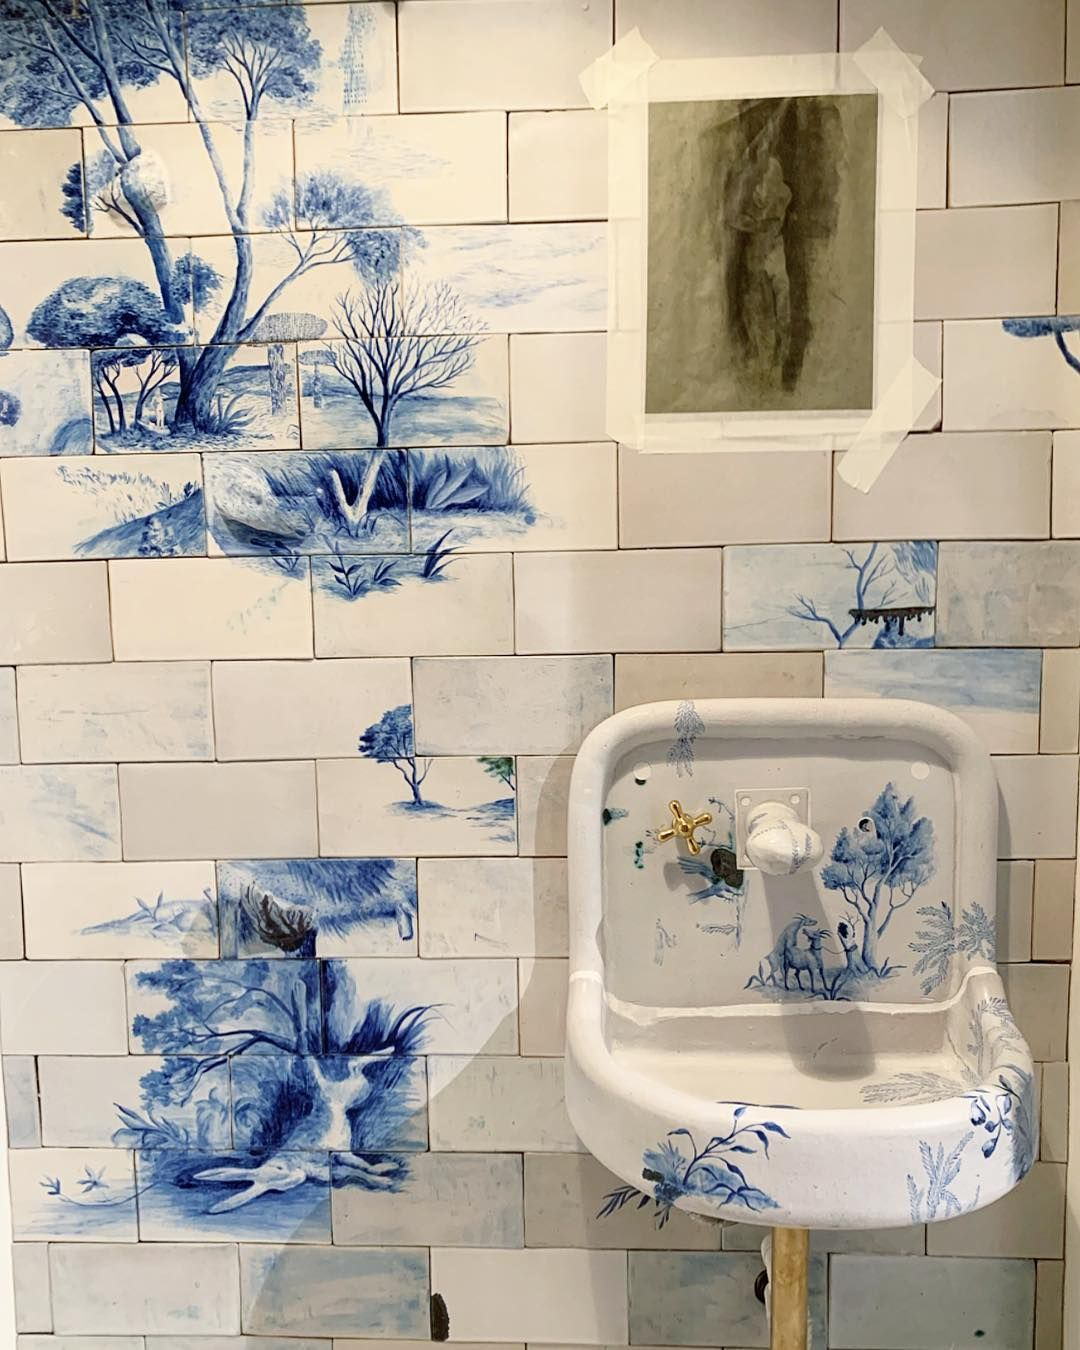 Image Via Whowhatwhit Instagram Original Post Tyler Hays Take On A Delft Bathroom Is An Painting Bathroom Tiles Hand Painted Tiles Bathroom Tile Bathroom